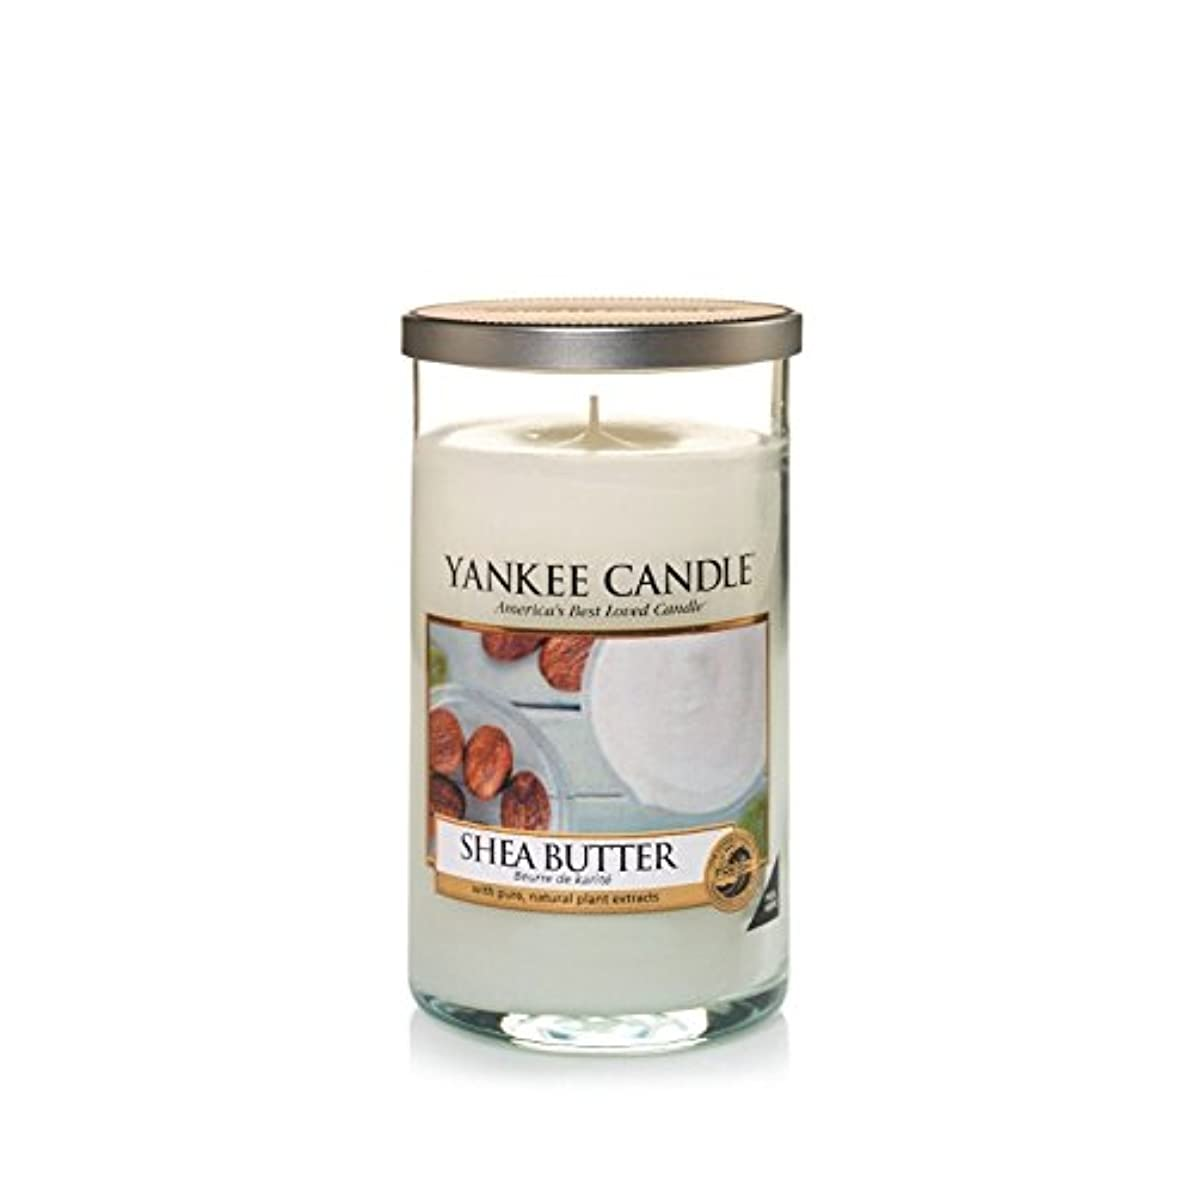 Yankee Candles Medium Pillar Candle - Shea Butter (Pack of 2) - ヤンキーキャンドルメディアピラーキャンドル - シアバター (x2) [並行輸入品]